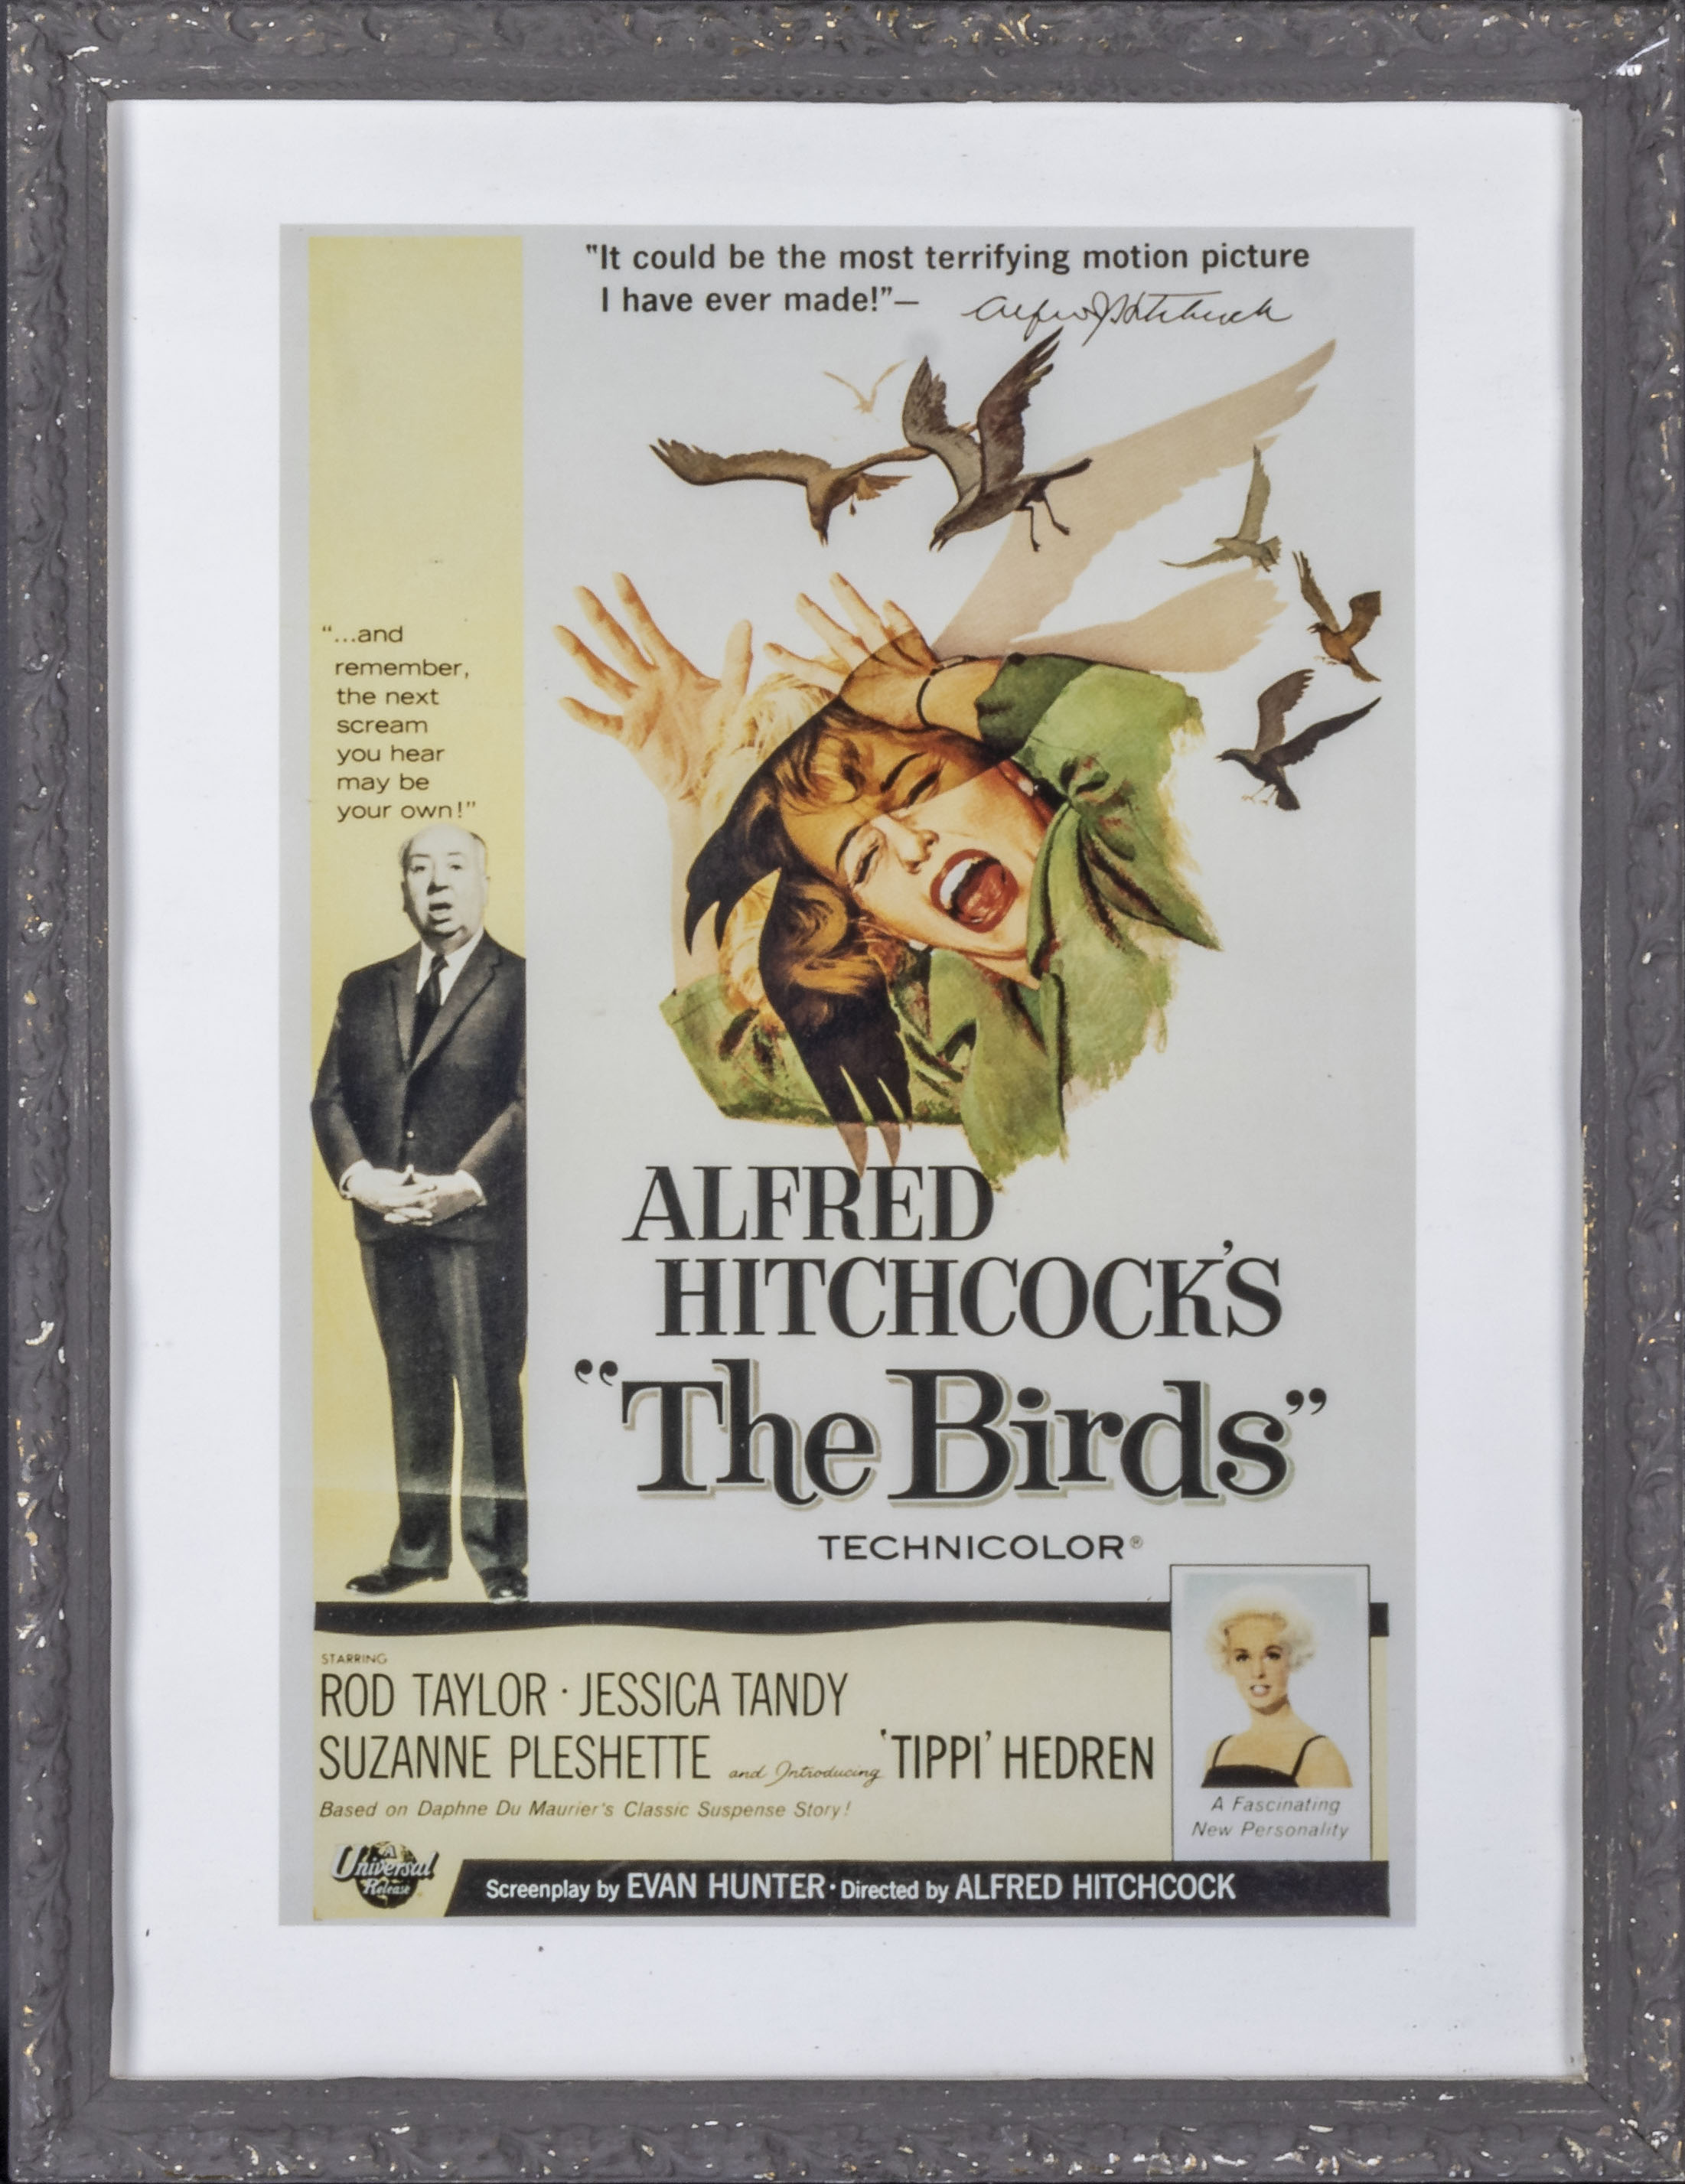 Tw framed advertising prints 'Casablanca' 38cm x 45cm and 'The Birds' 34cm x 44cm - Image 3 of 3